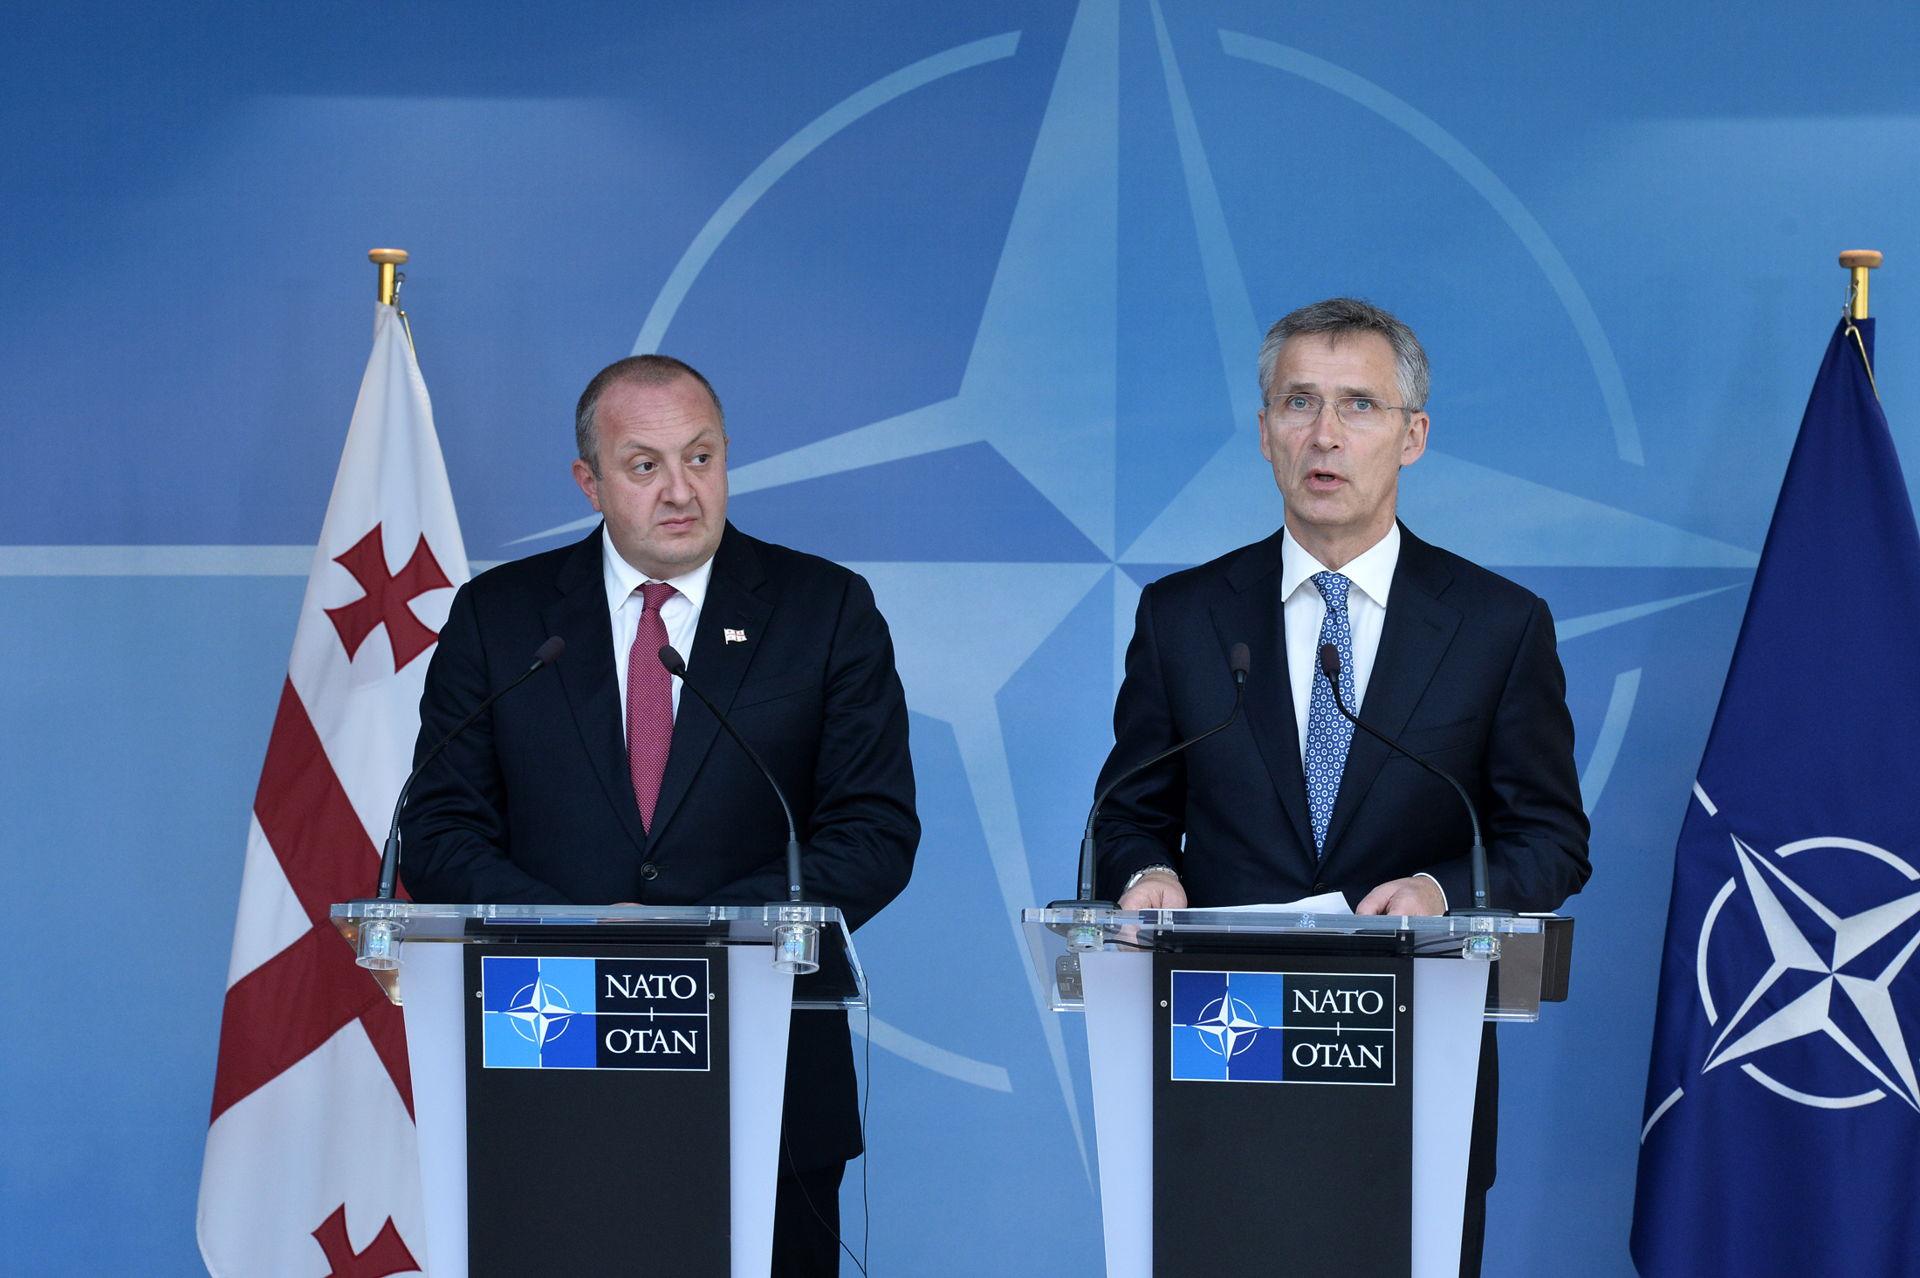 NATO Summit Special Series: Georgia